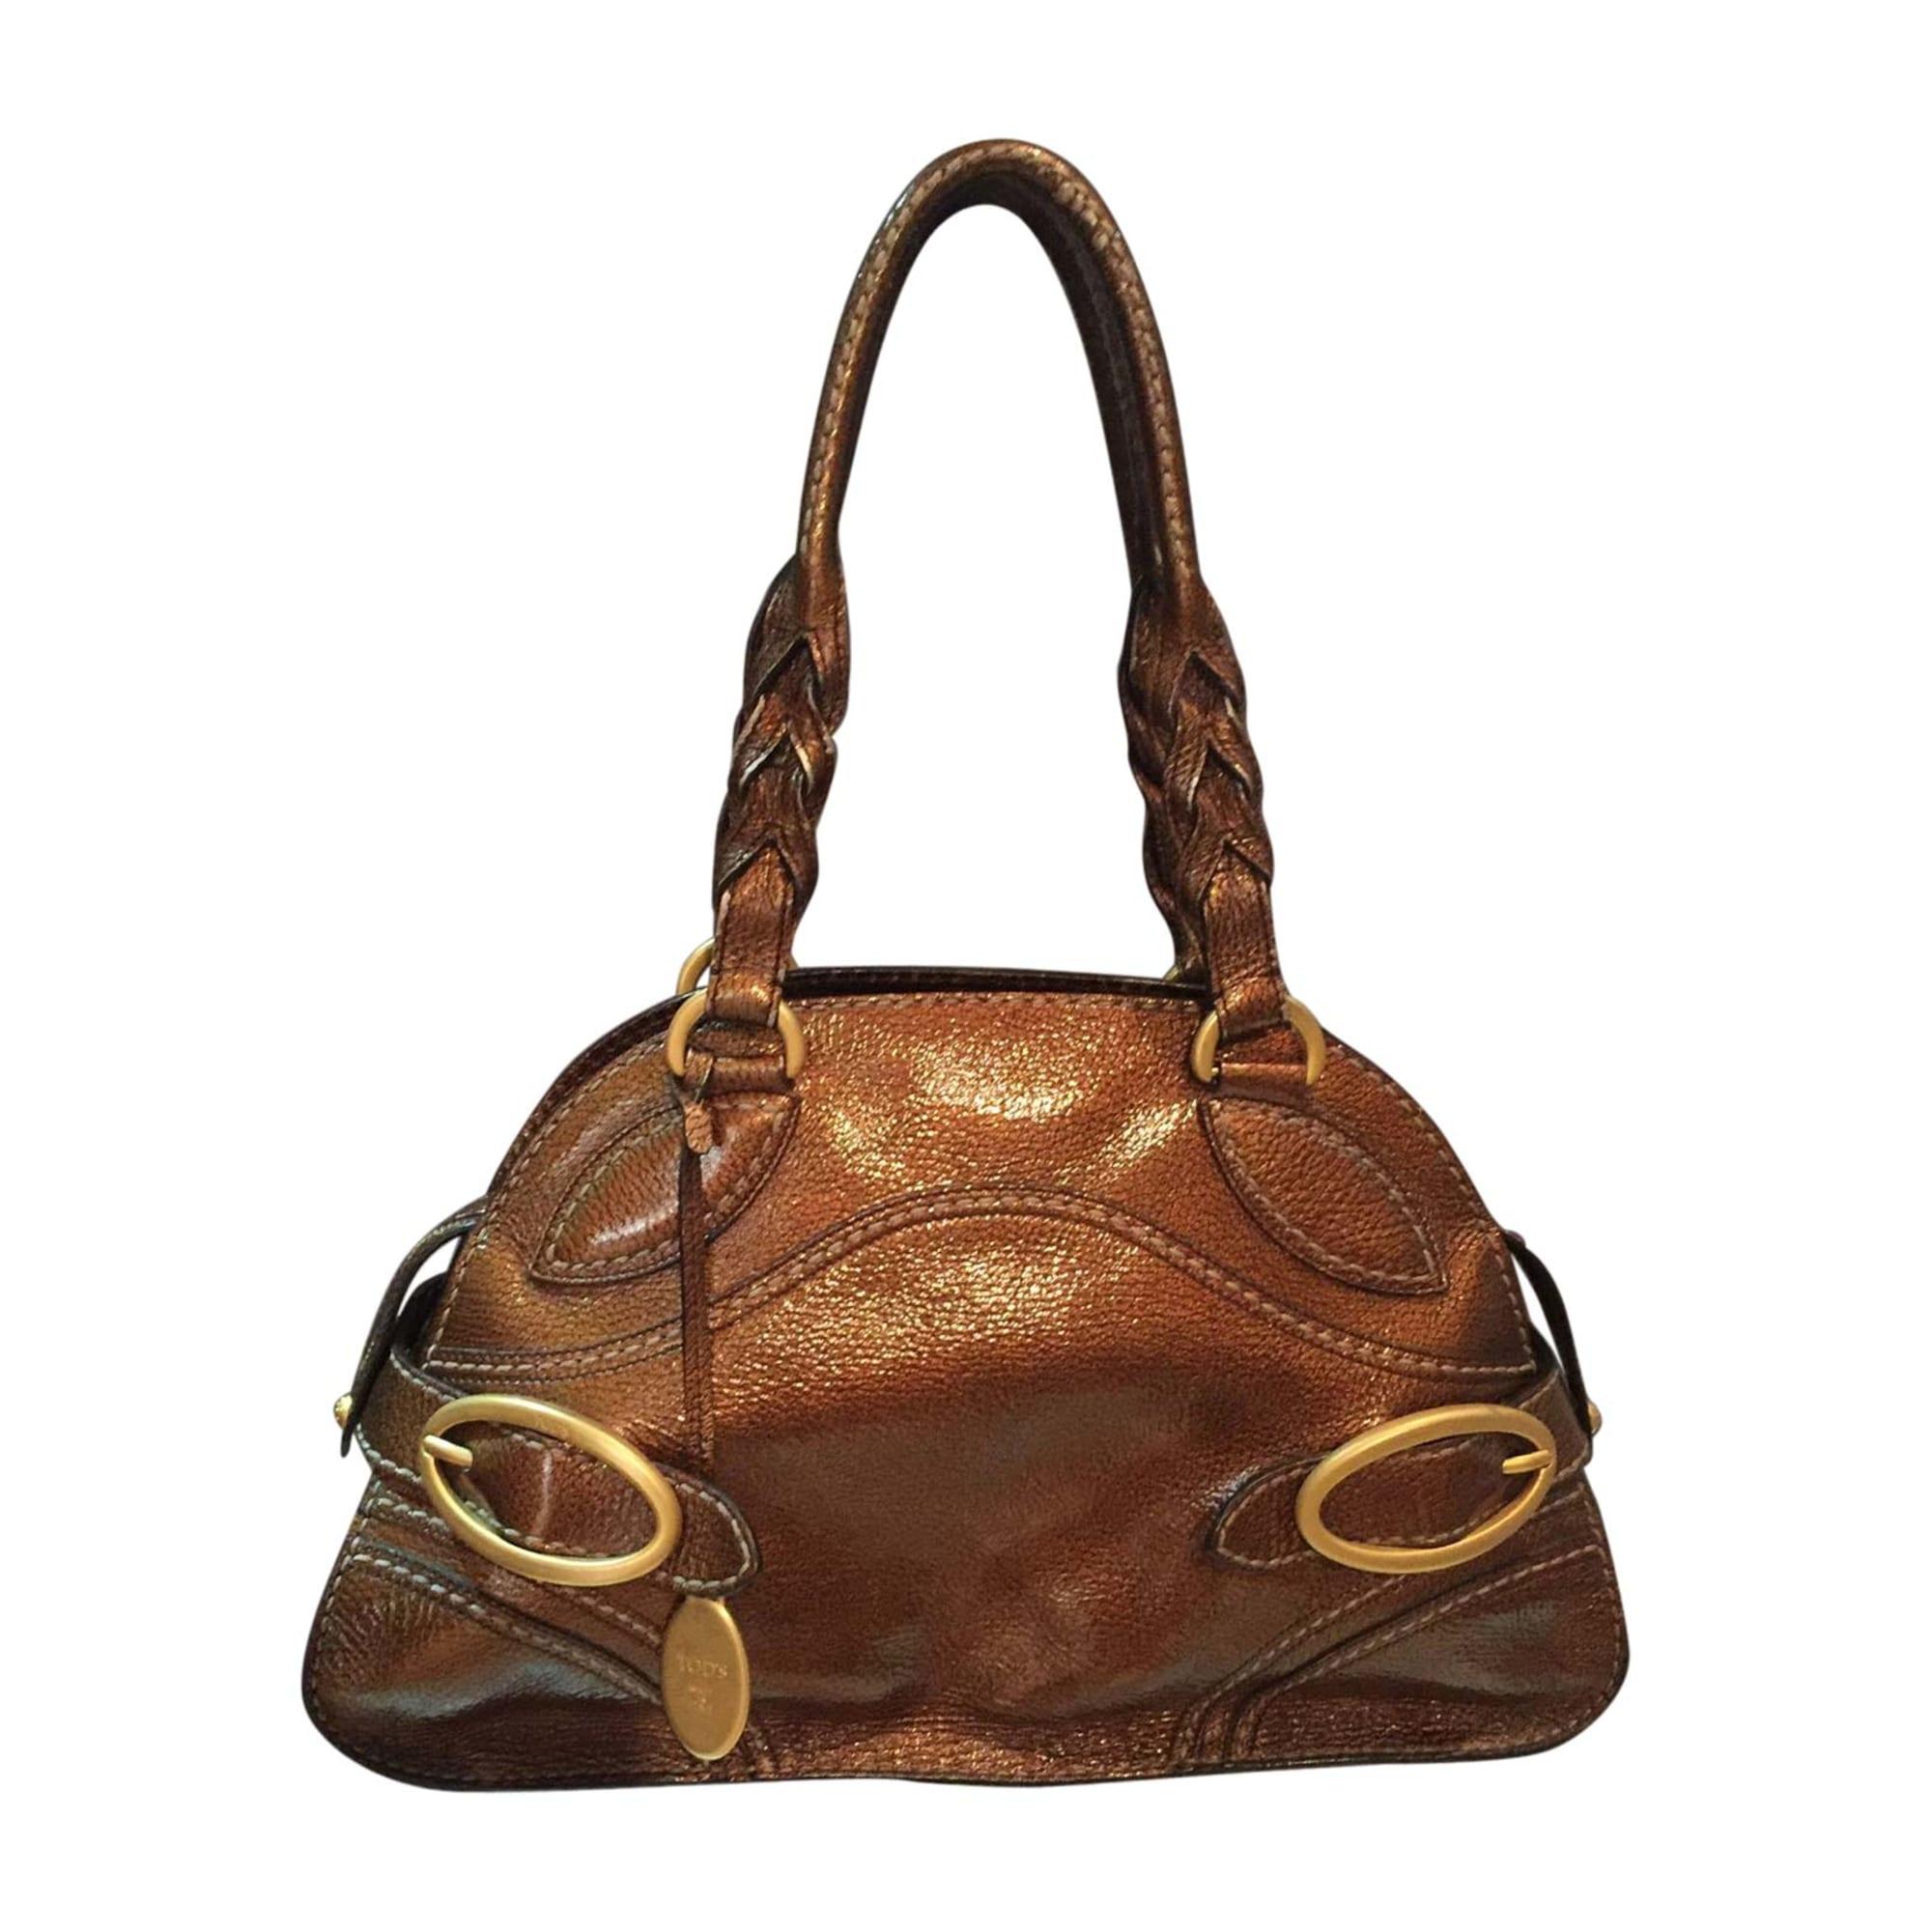 Sac XL en cuir TOD'S Doré, bronze, cuivre